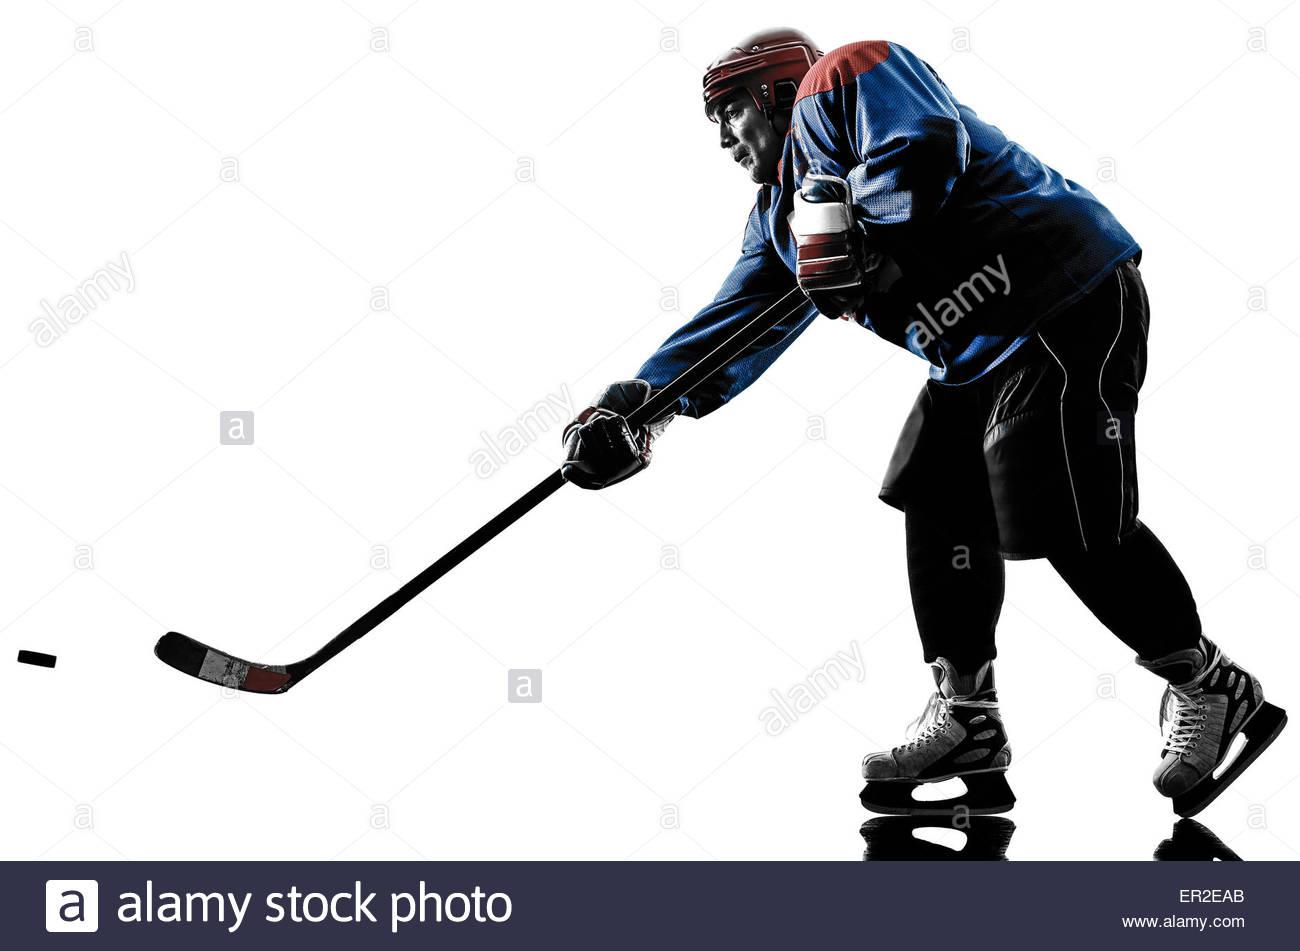 1300x951 Ice Hockey Player Man Stock Photos Amp Ice Hockey Player Man Stock